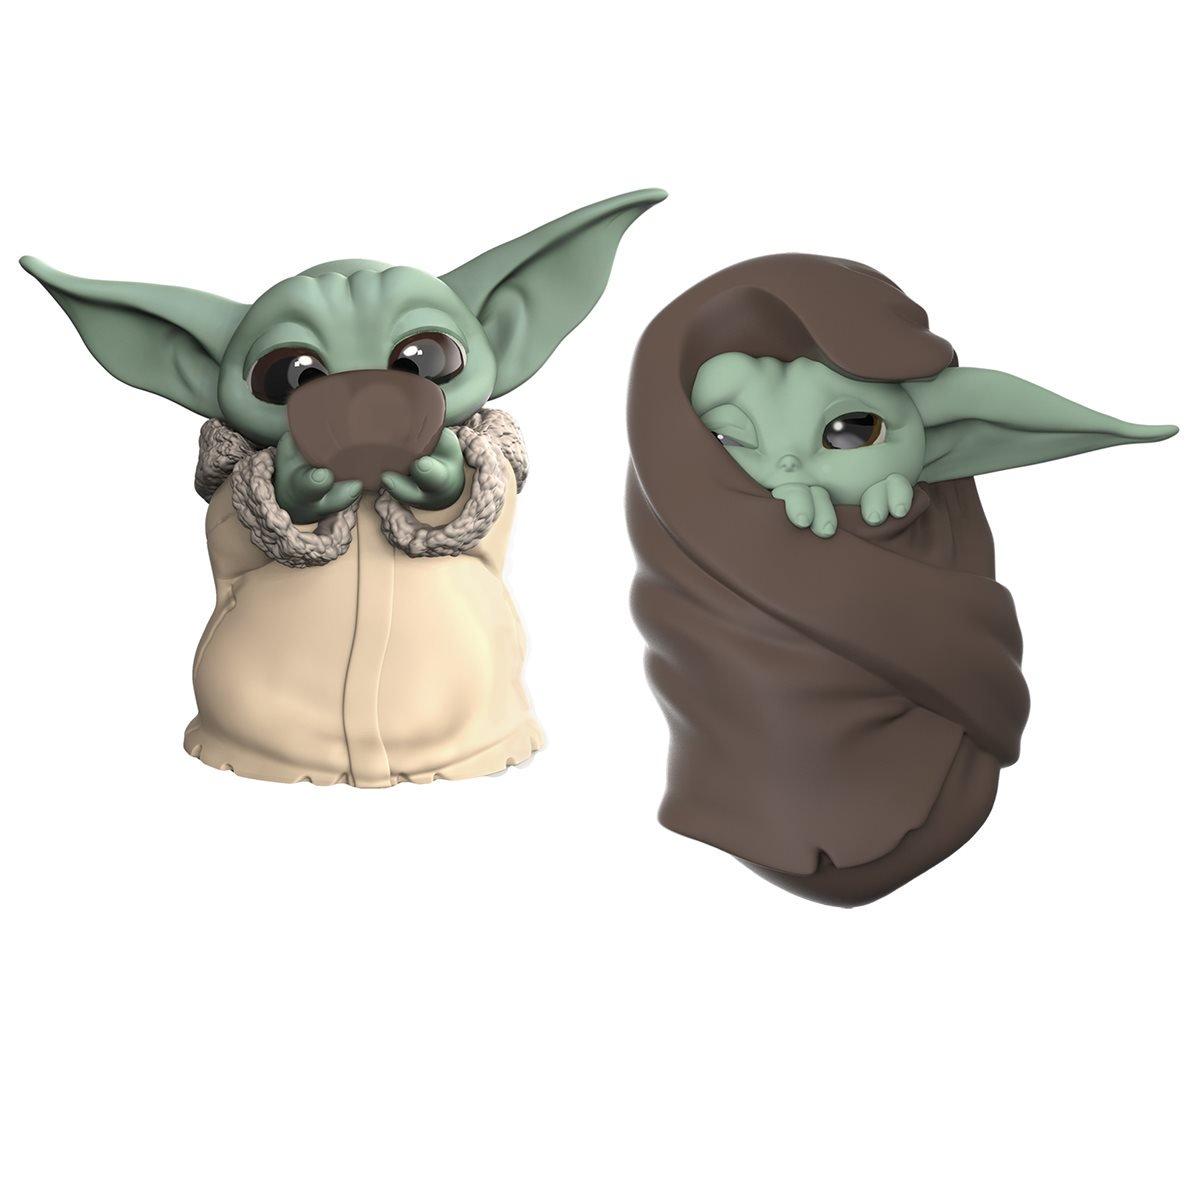 Hasbro - Star Wars - The Mandalorian - Baby Yoda - Baby Bounties Soup and Blanket Mini-Figures - 01